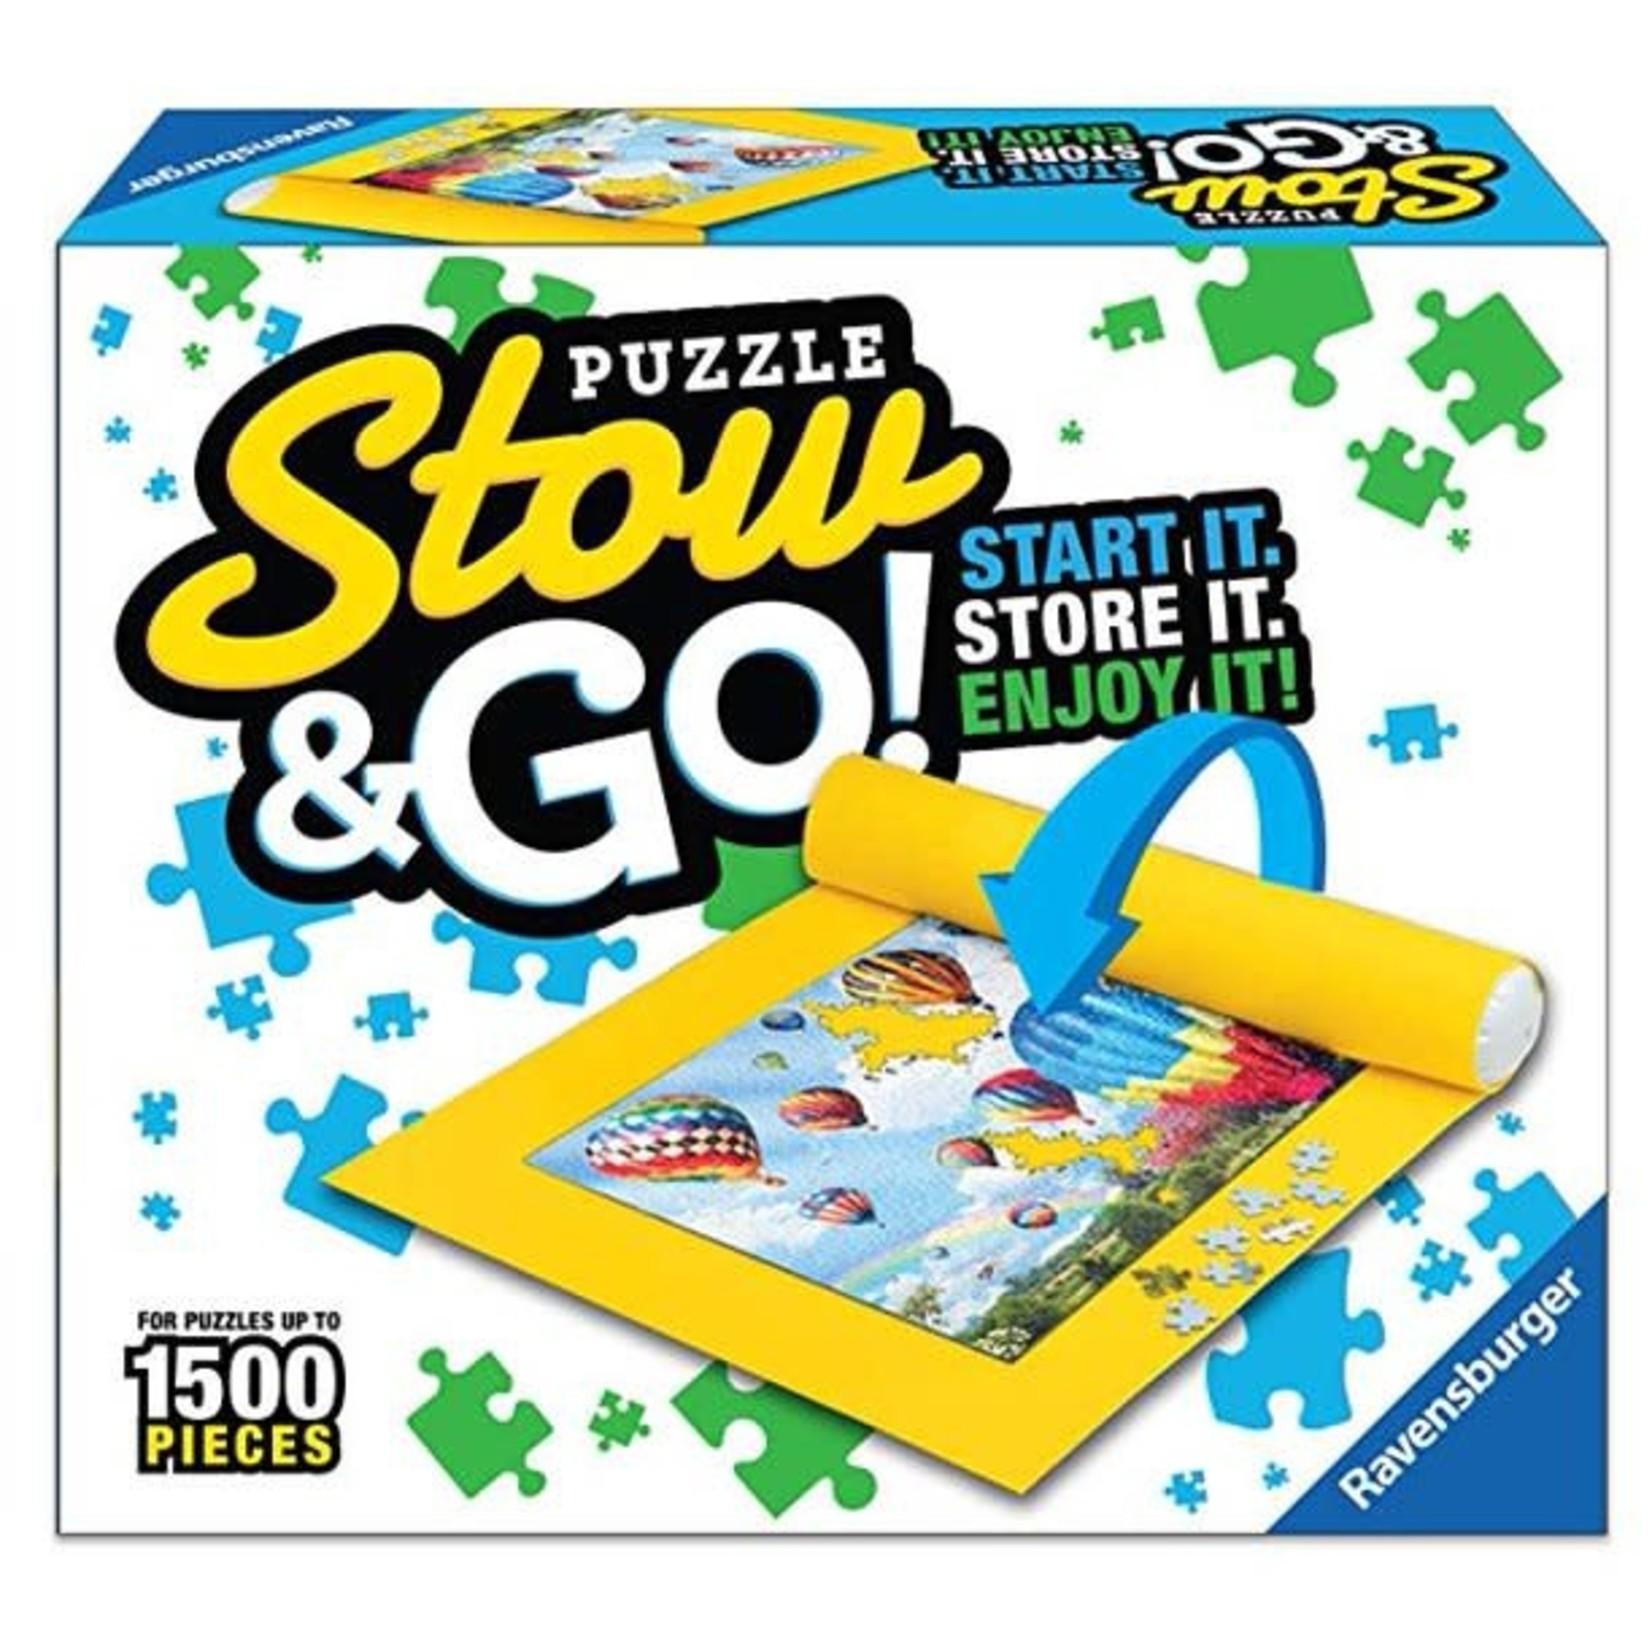 Ravensburger Puzzle Stow & Go!